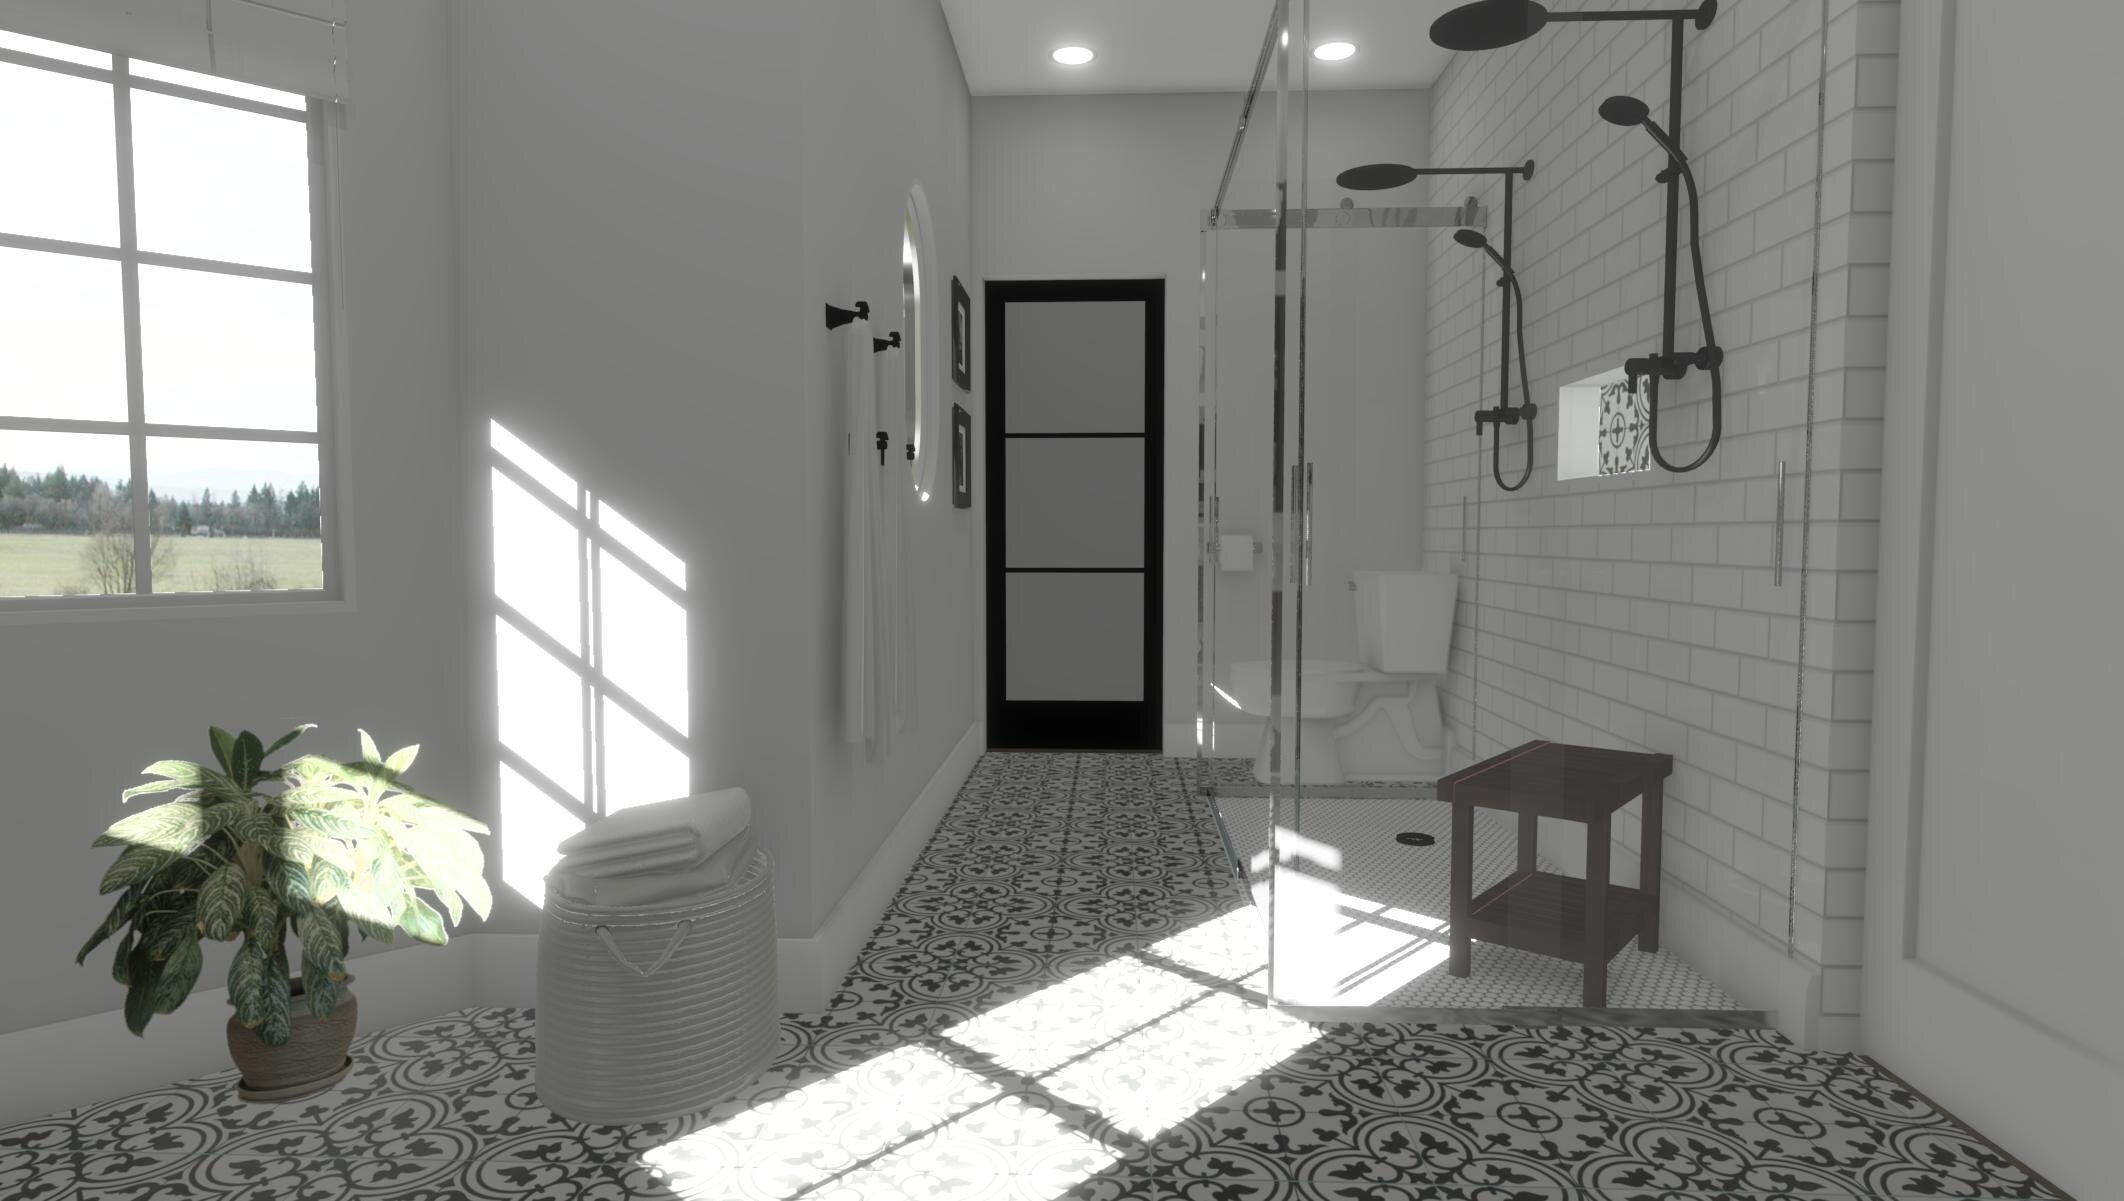 Golf Club Bathroom By ALOMA Home Staging & Design